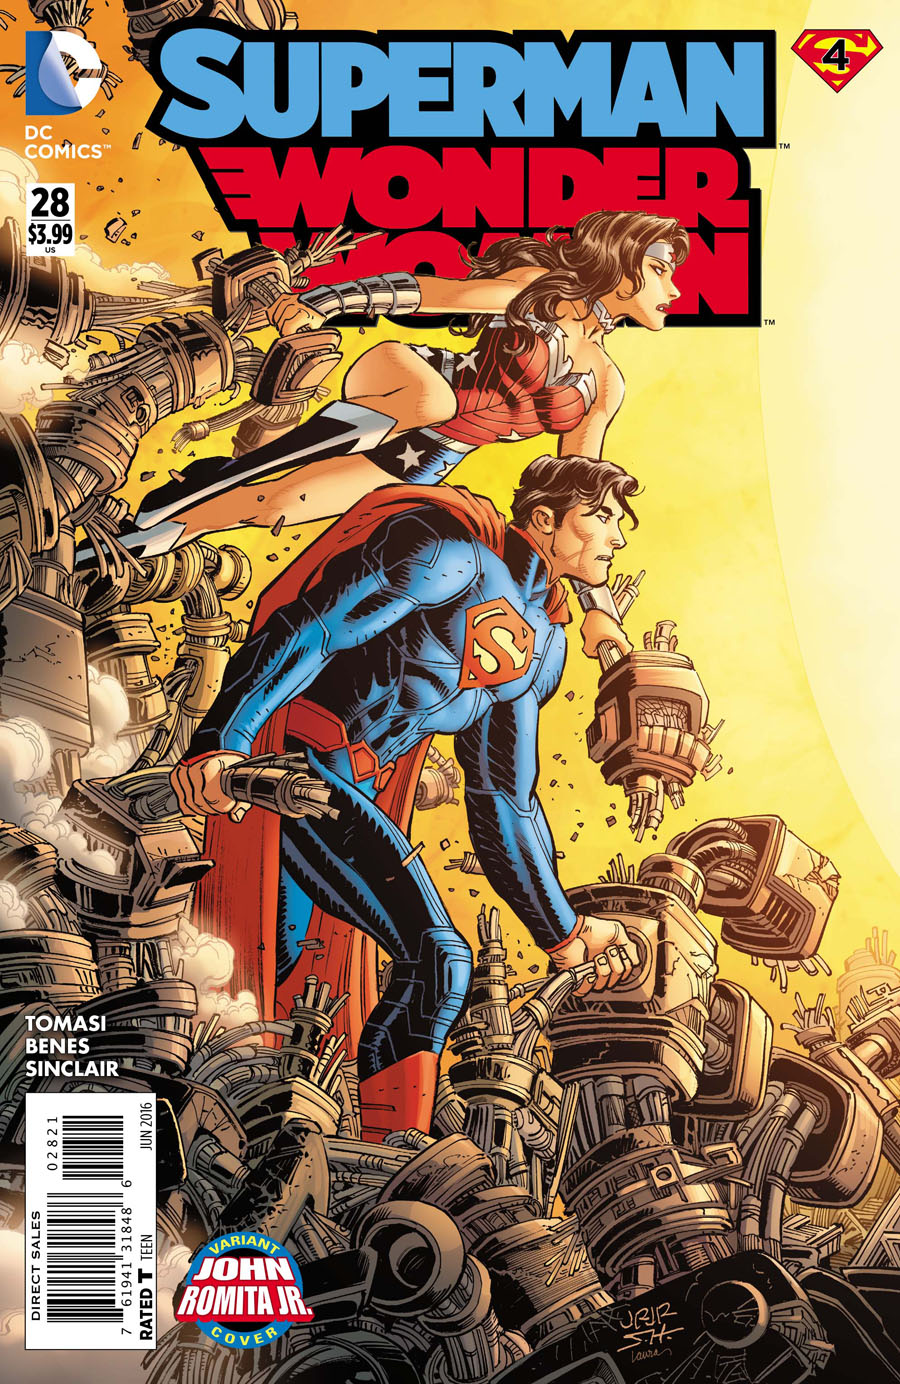 Superman Wonder Woman #28 Cover B Variant John Romita Jr Cover (Super League Part 4)